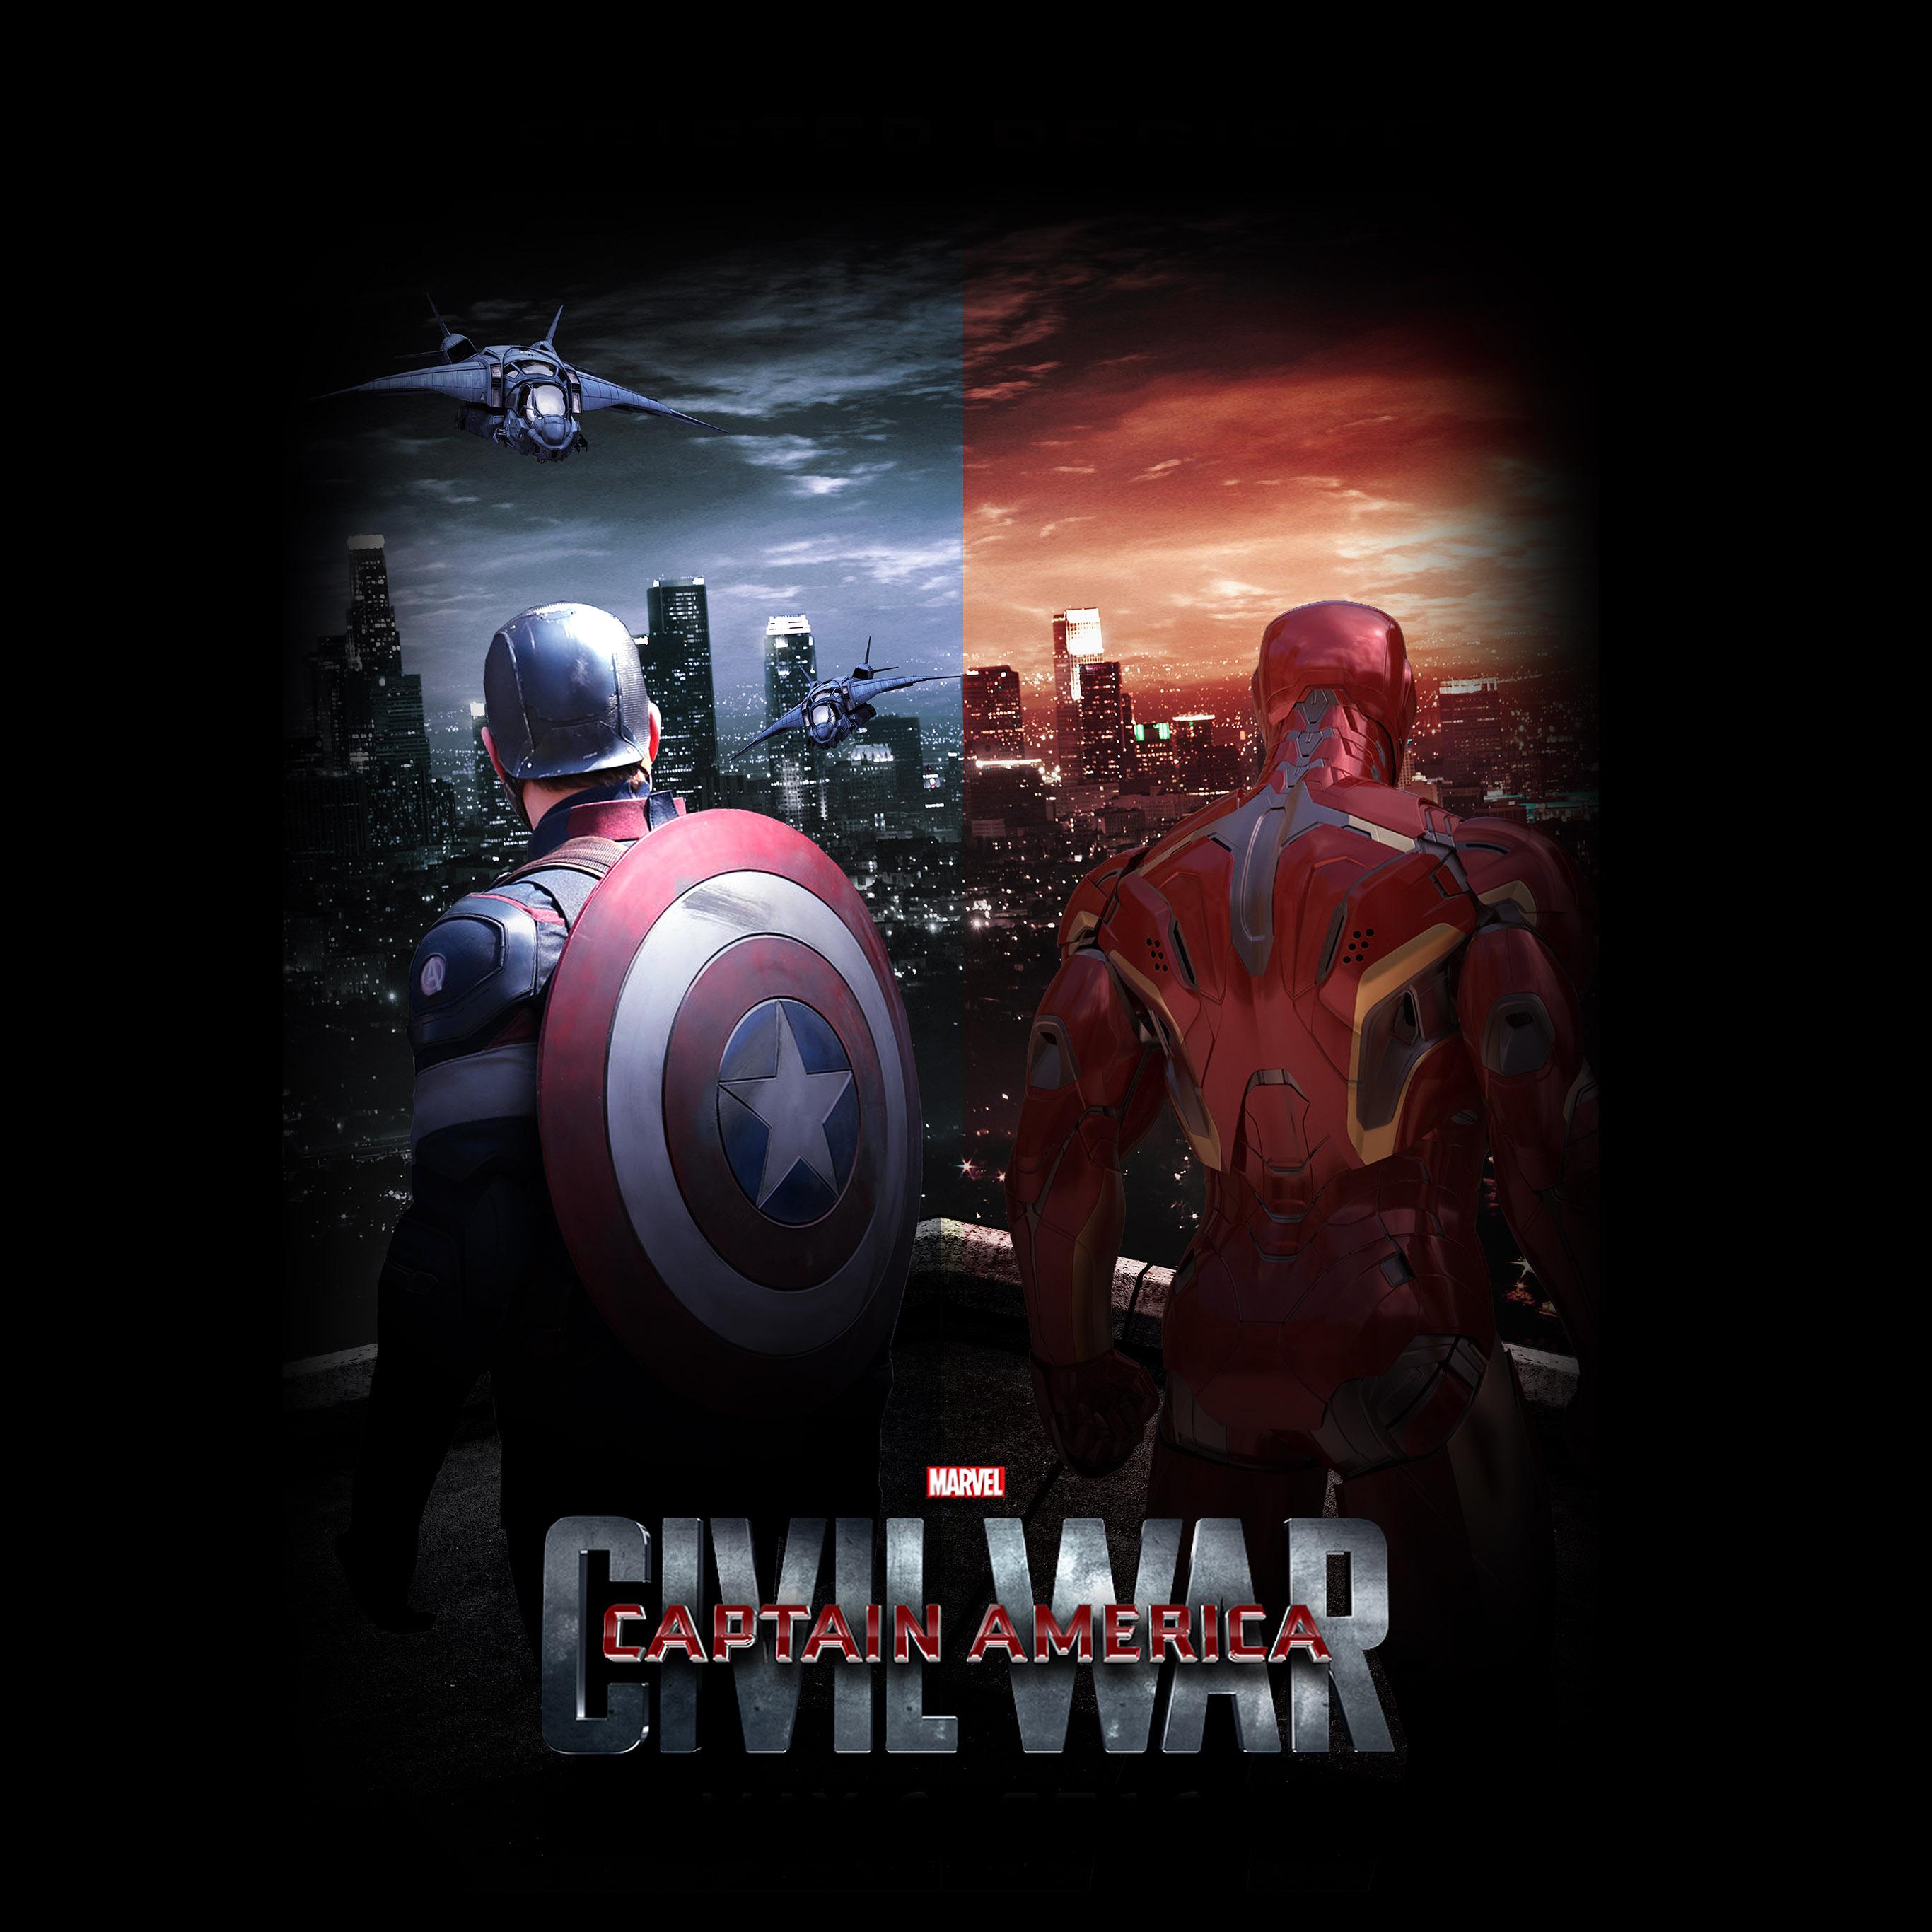 Avengers Wallpaper Iphone 6 Aq73 Captain America Civilwar Art Poster Hero Wallpaper